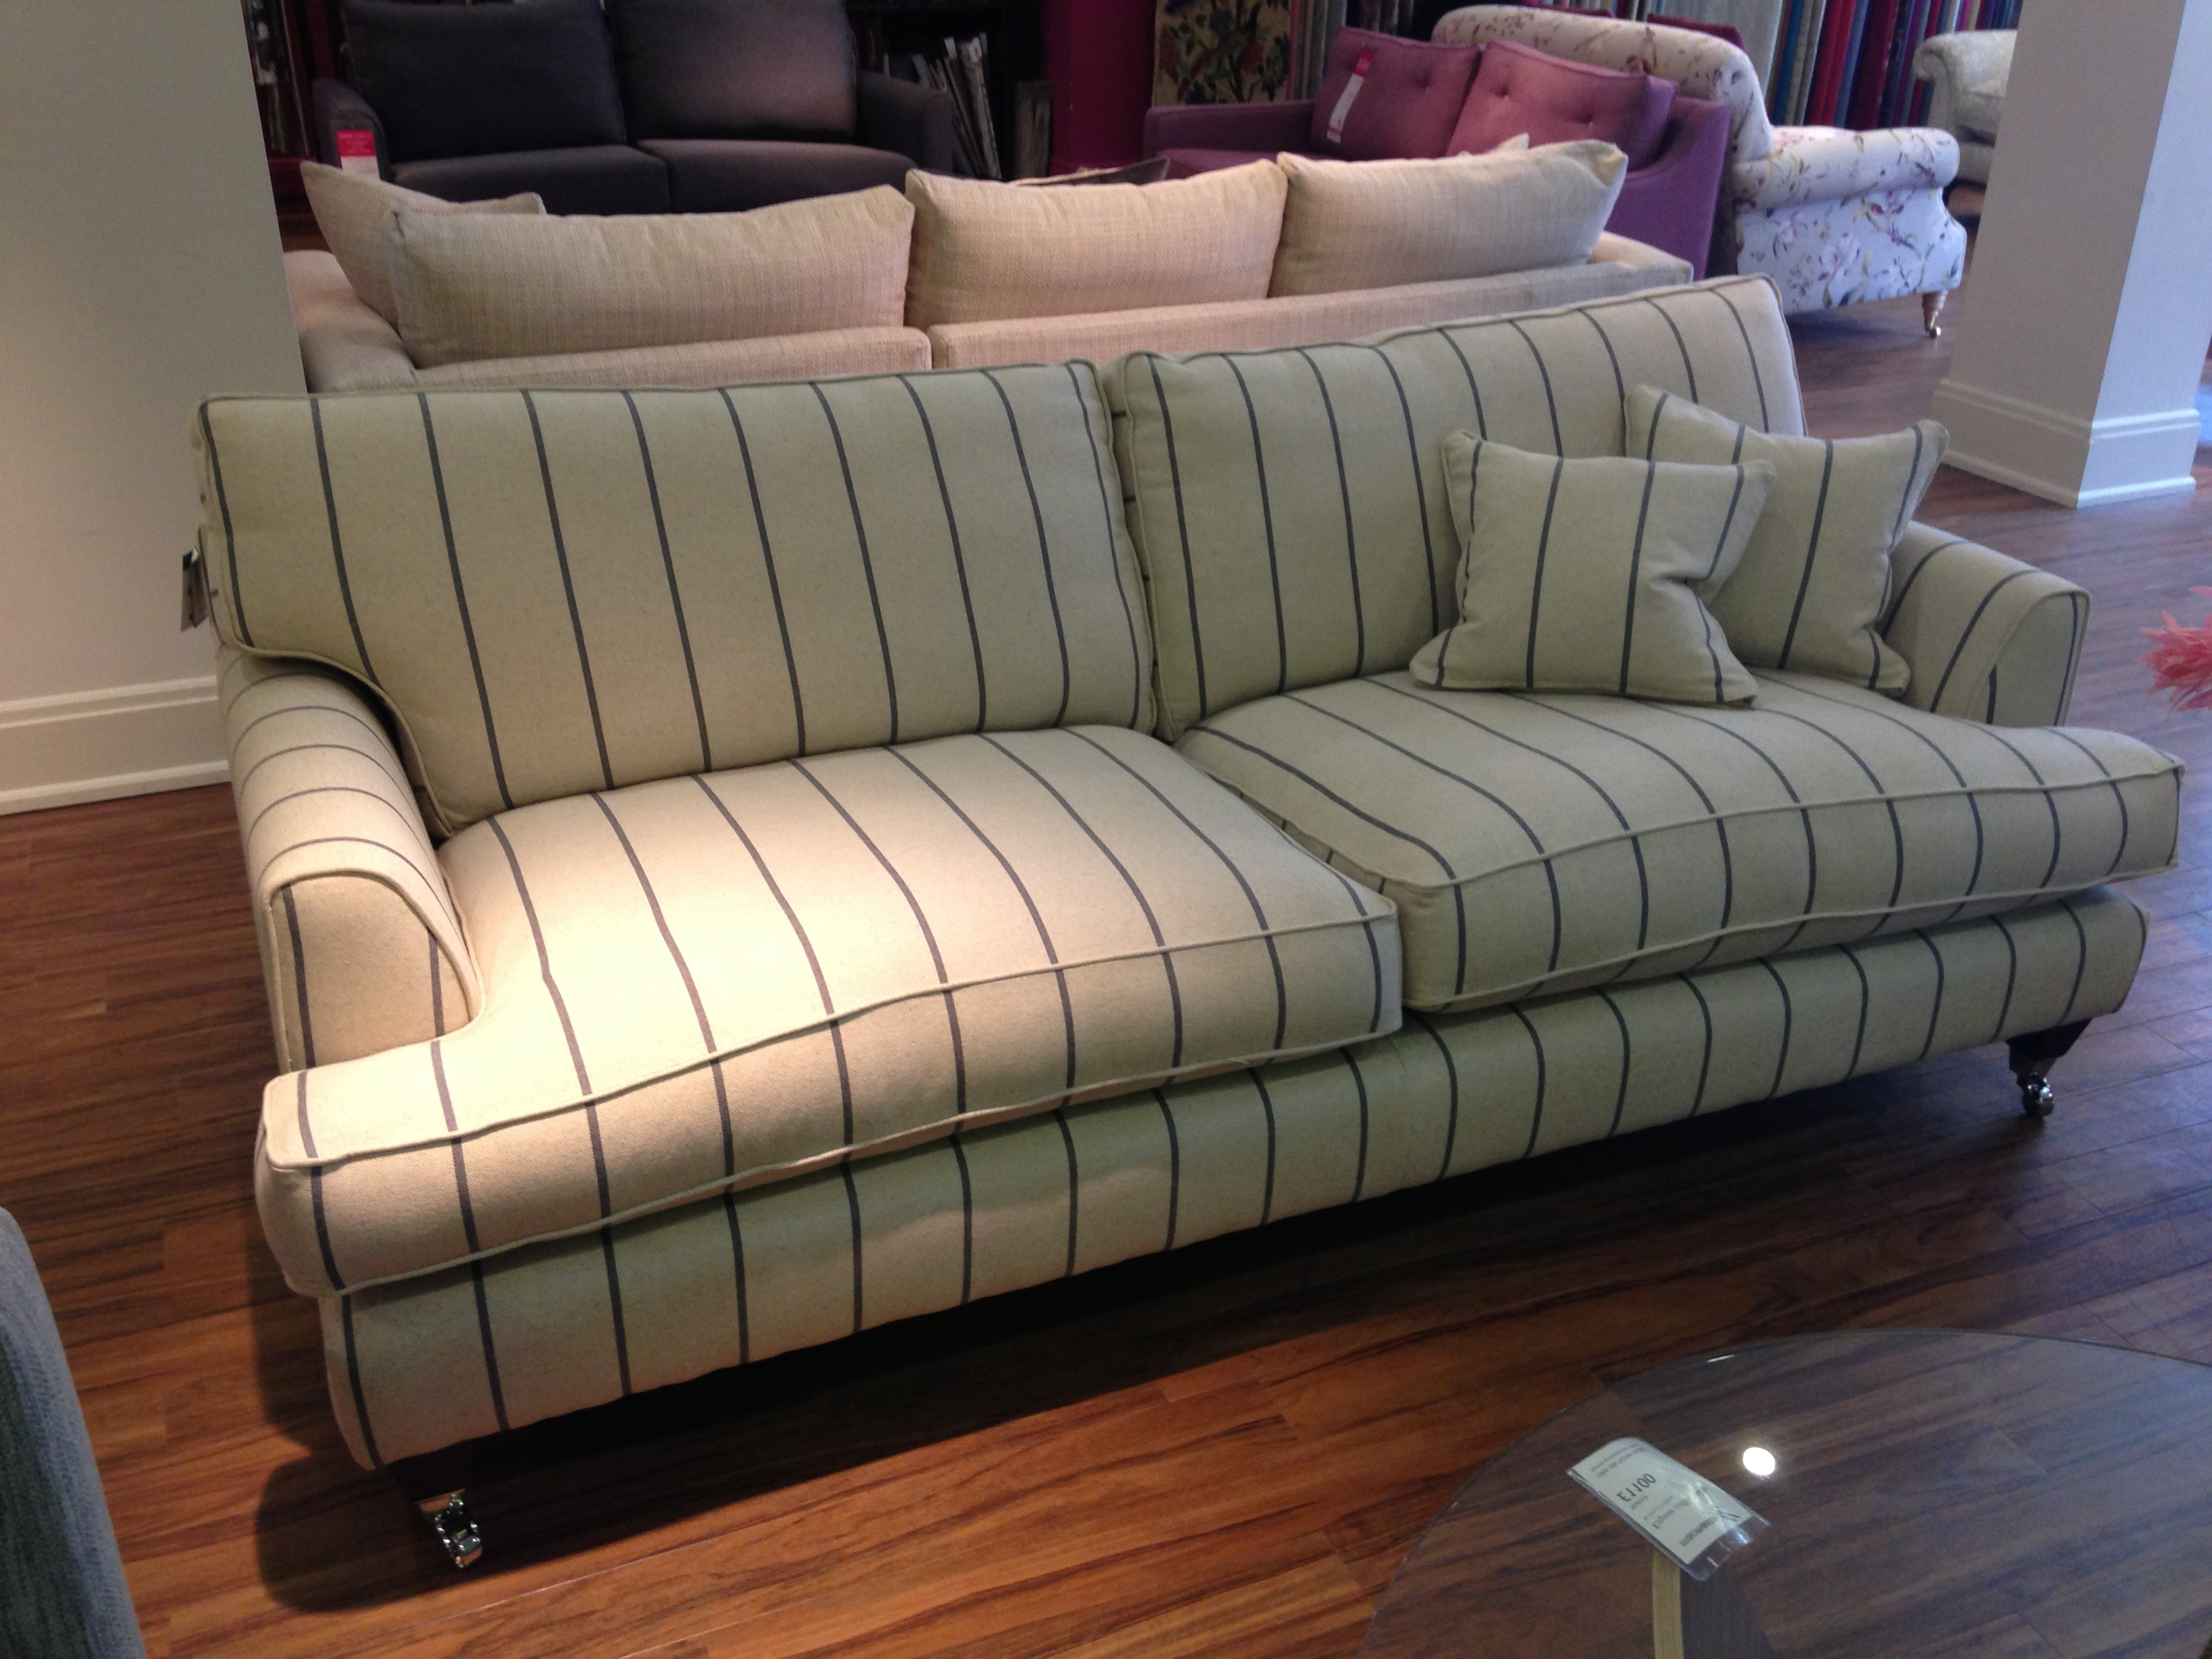 Florence Large Sofa In Heron Stripe Http://www.sofaworkshop intended for 2018 Florence Medium Sofas